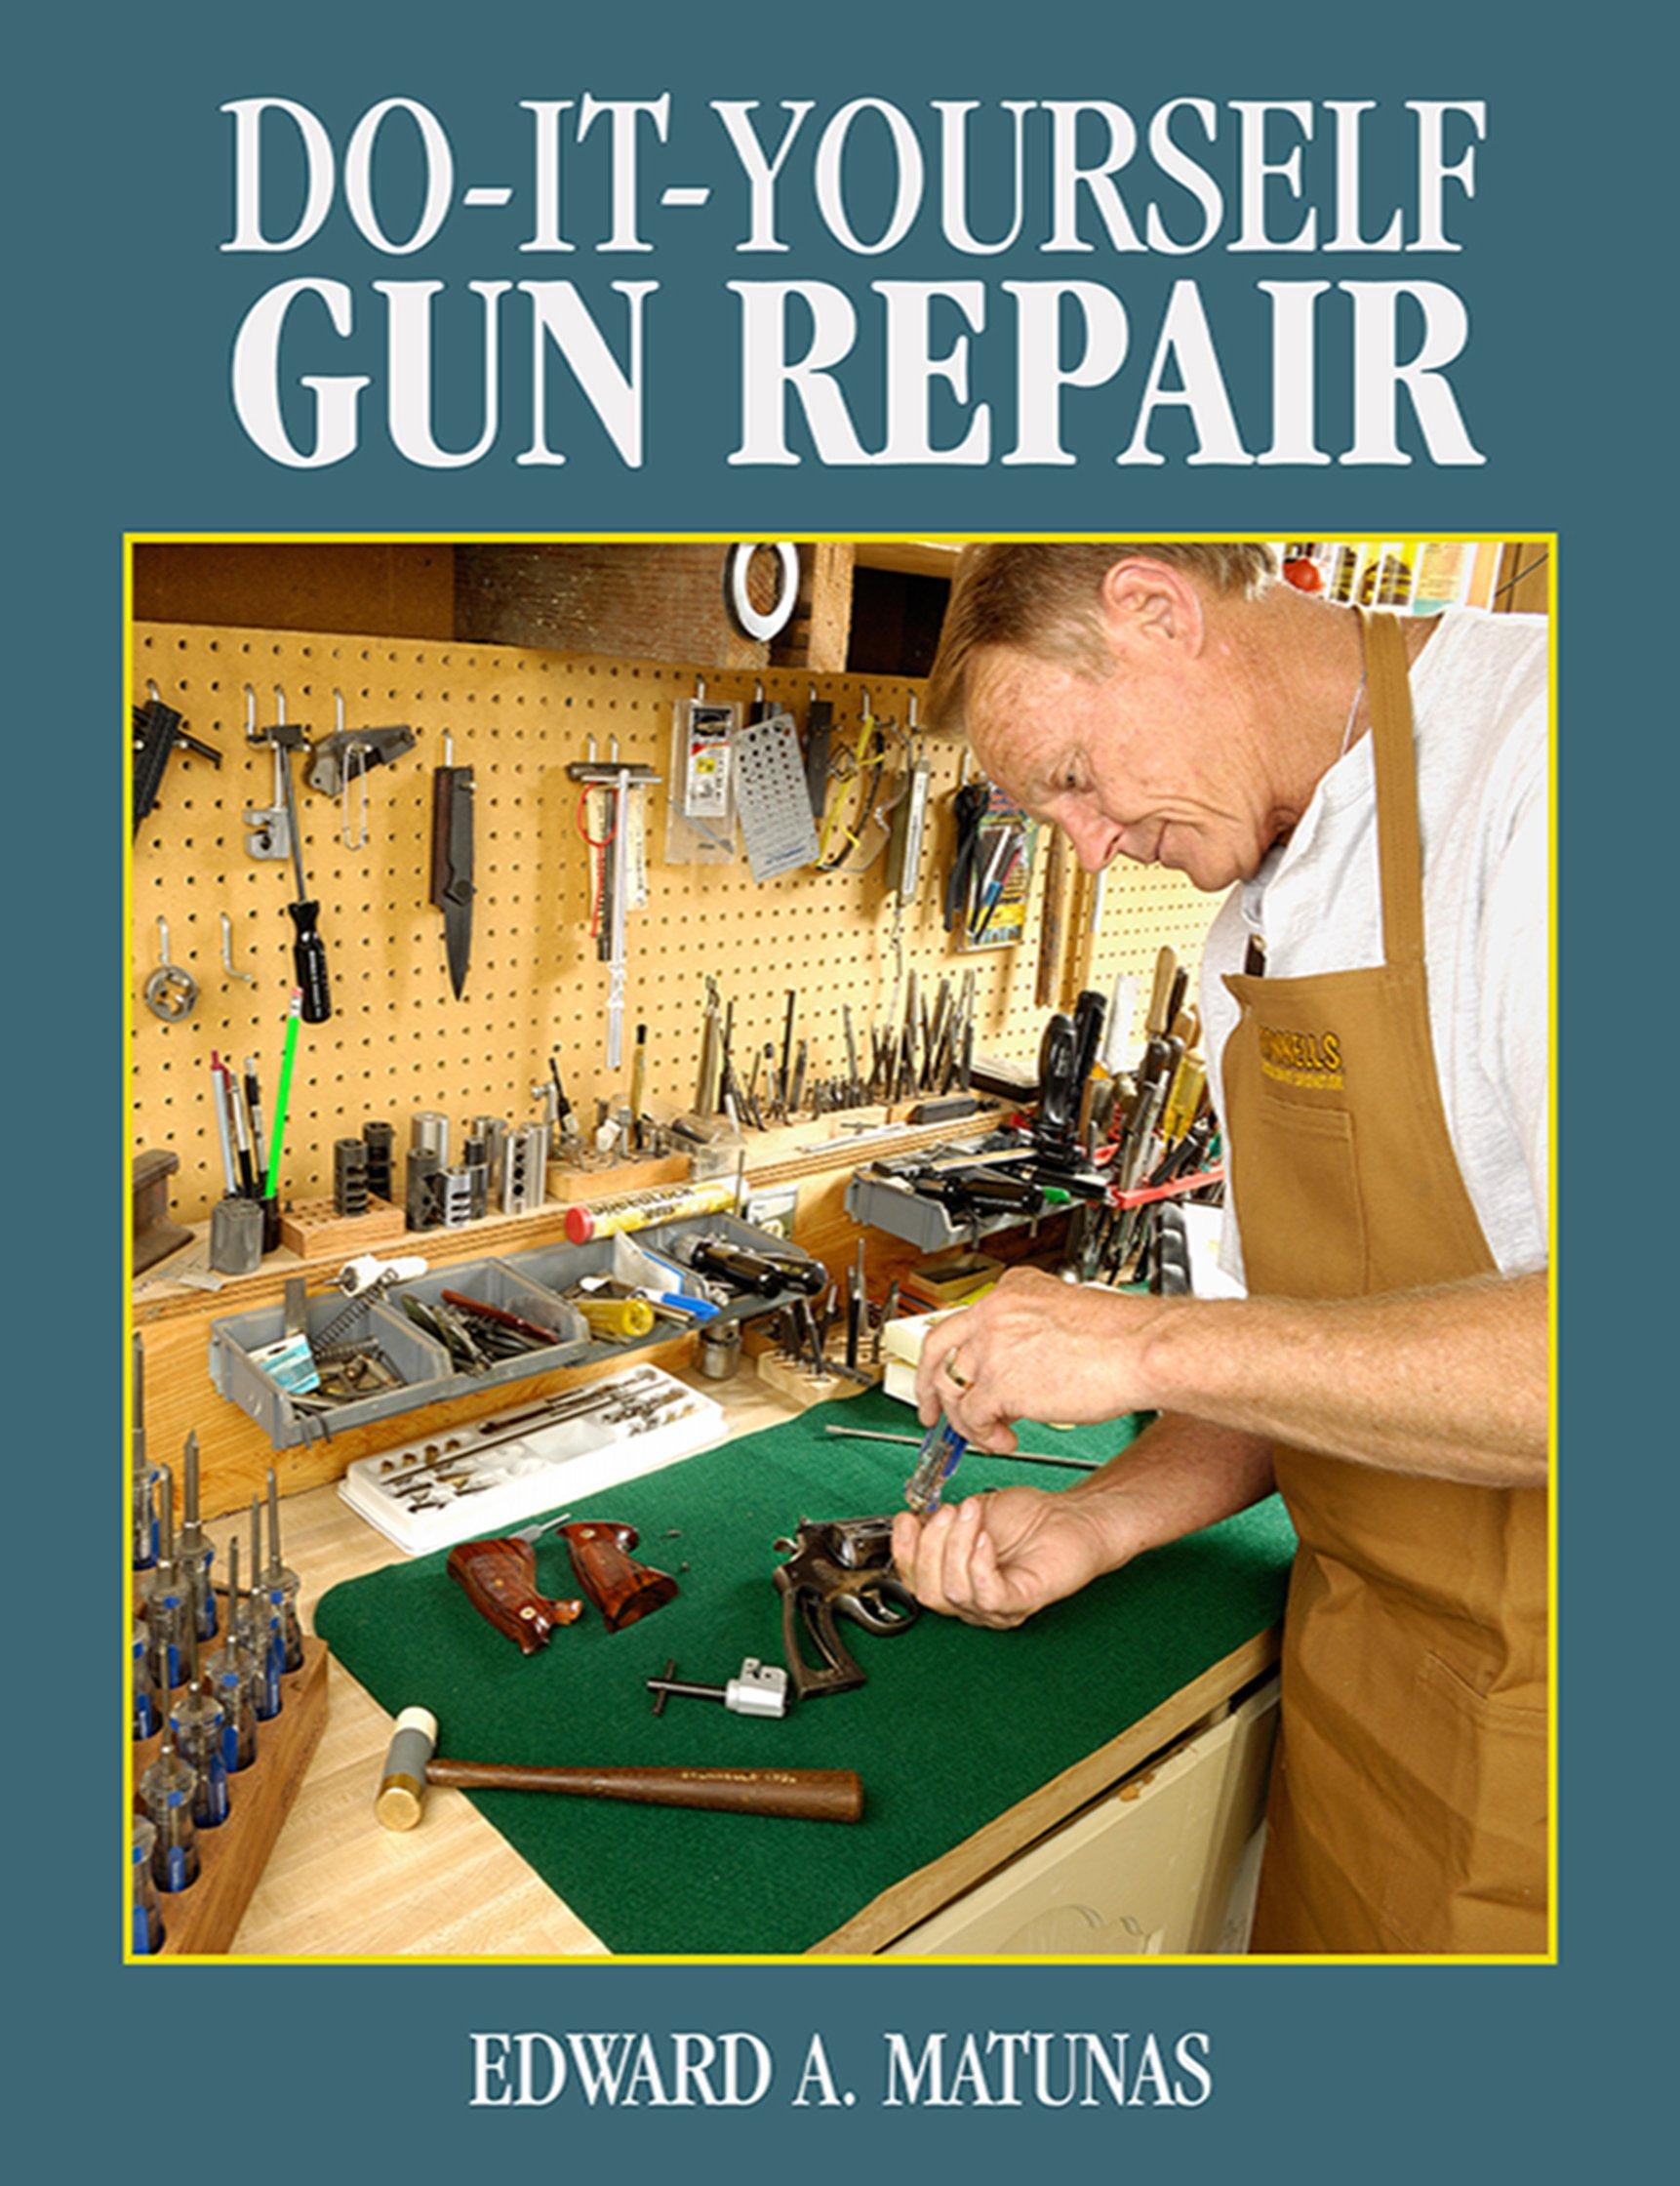 Amazon.com: Do-It-Yourself Gun Repair: Gunsmithing at Home (9781620876961):  Edward A. Matunas: Books